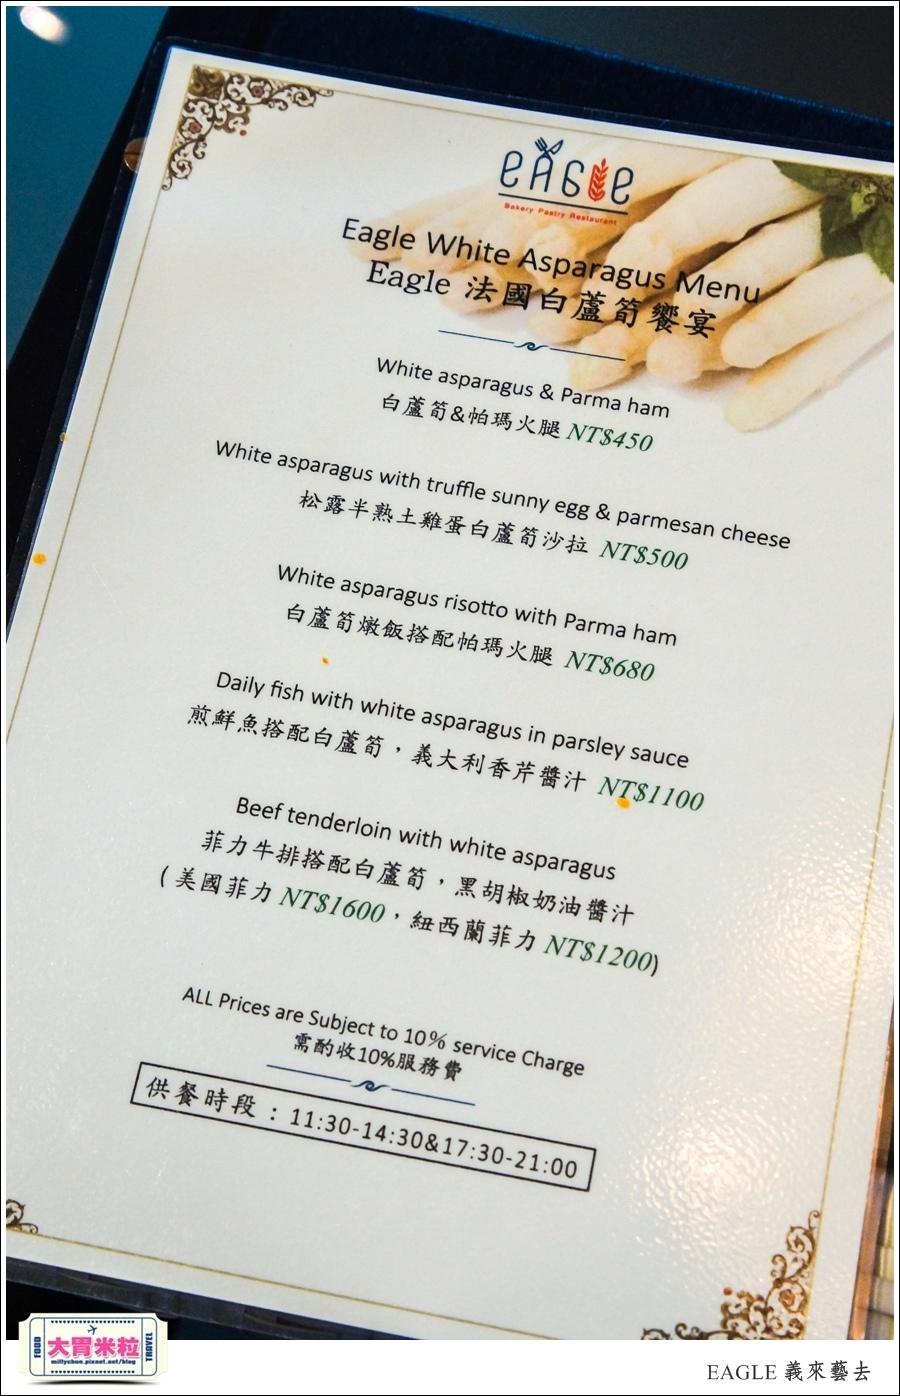 Hellmann's 康寶美玉白汁全台美味沙拉之旅xEAGLE 義來藝去義法餐廳@高雄義法餐廳推薦@大胃米粒0032.jpg